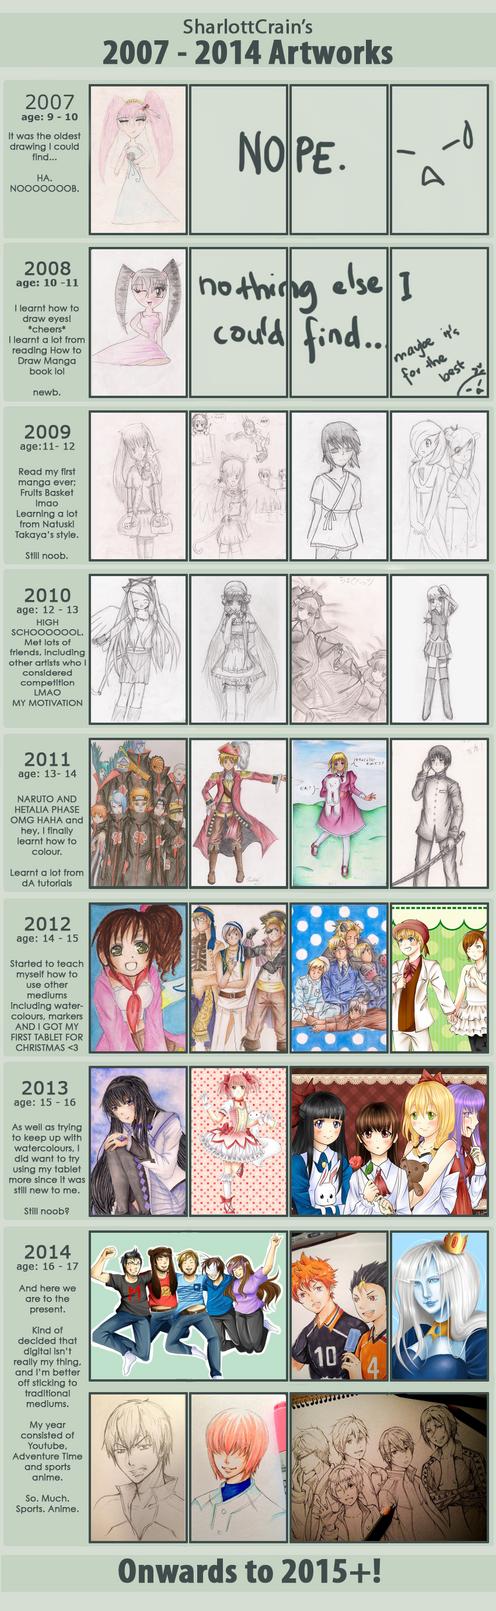 IMPROVEMENT MEME 2007 - 2014 by Gardevoir1997